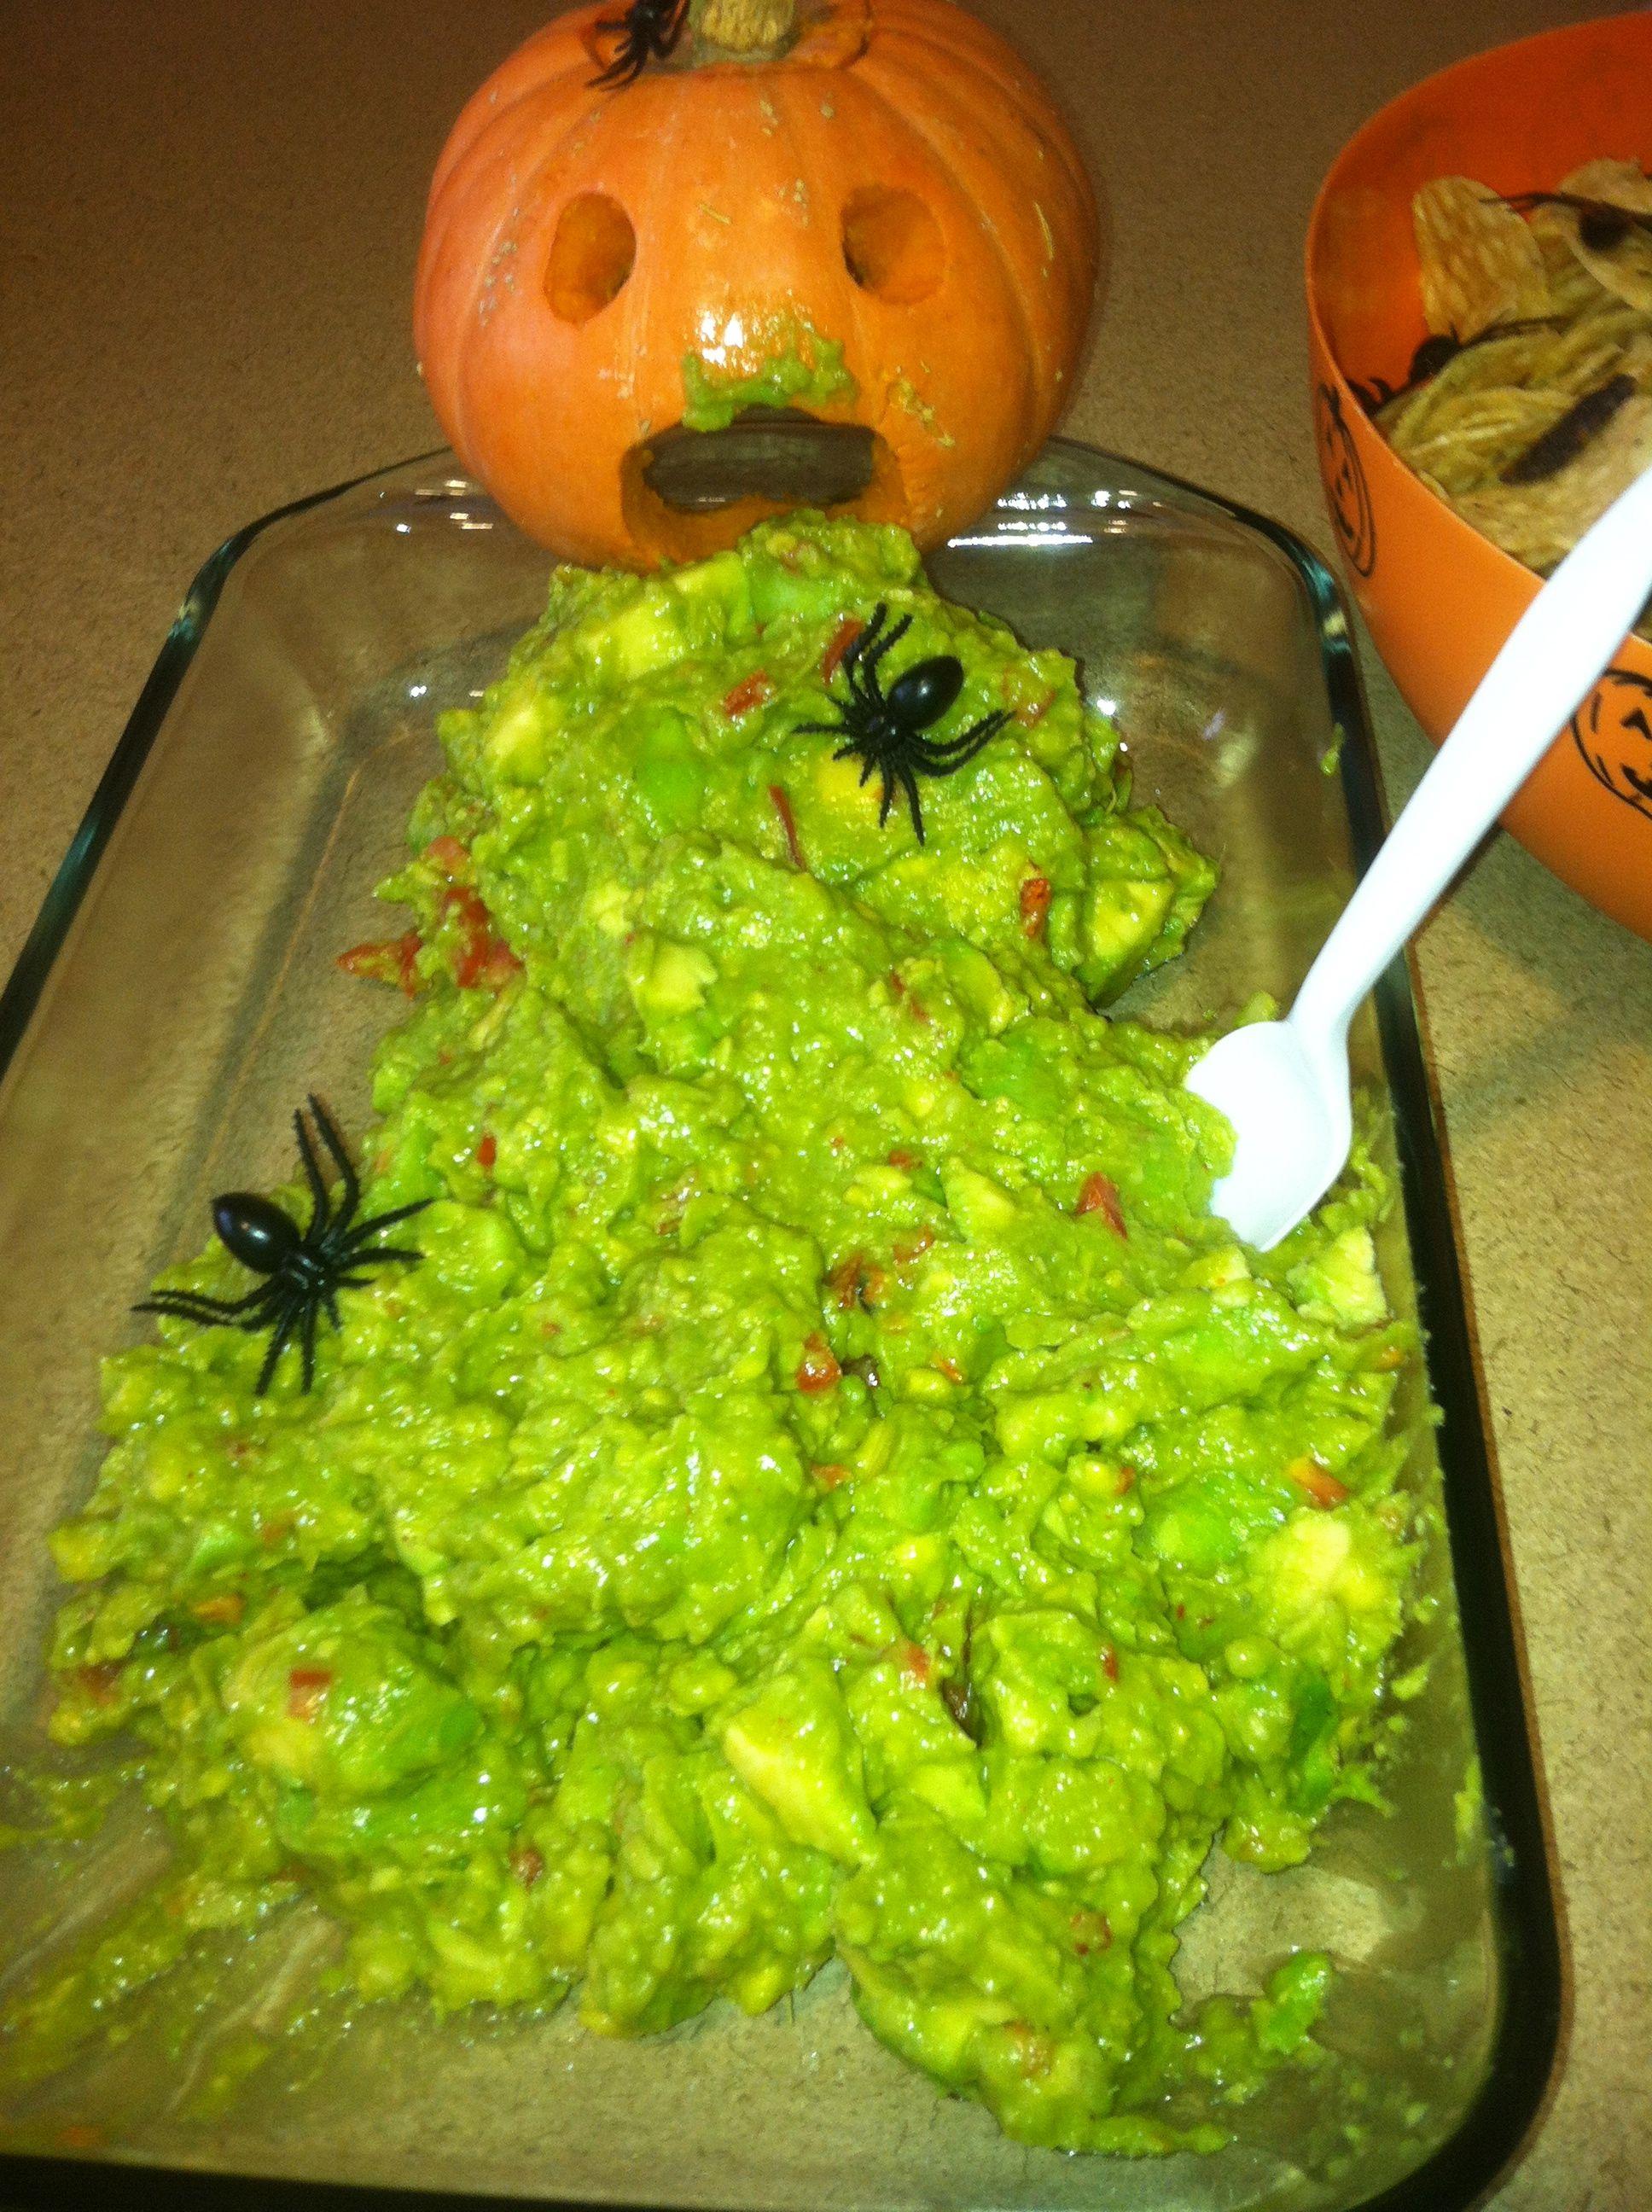 made this for a halloween potluck! Halloween treats